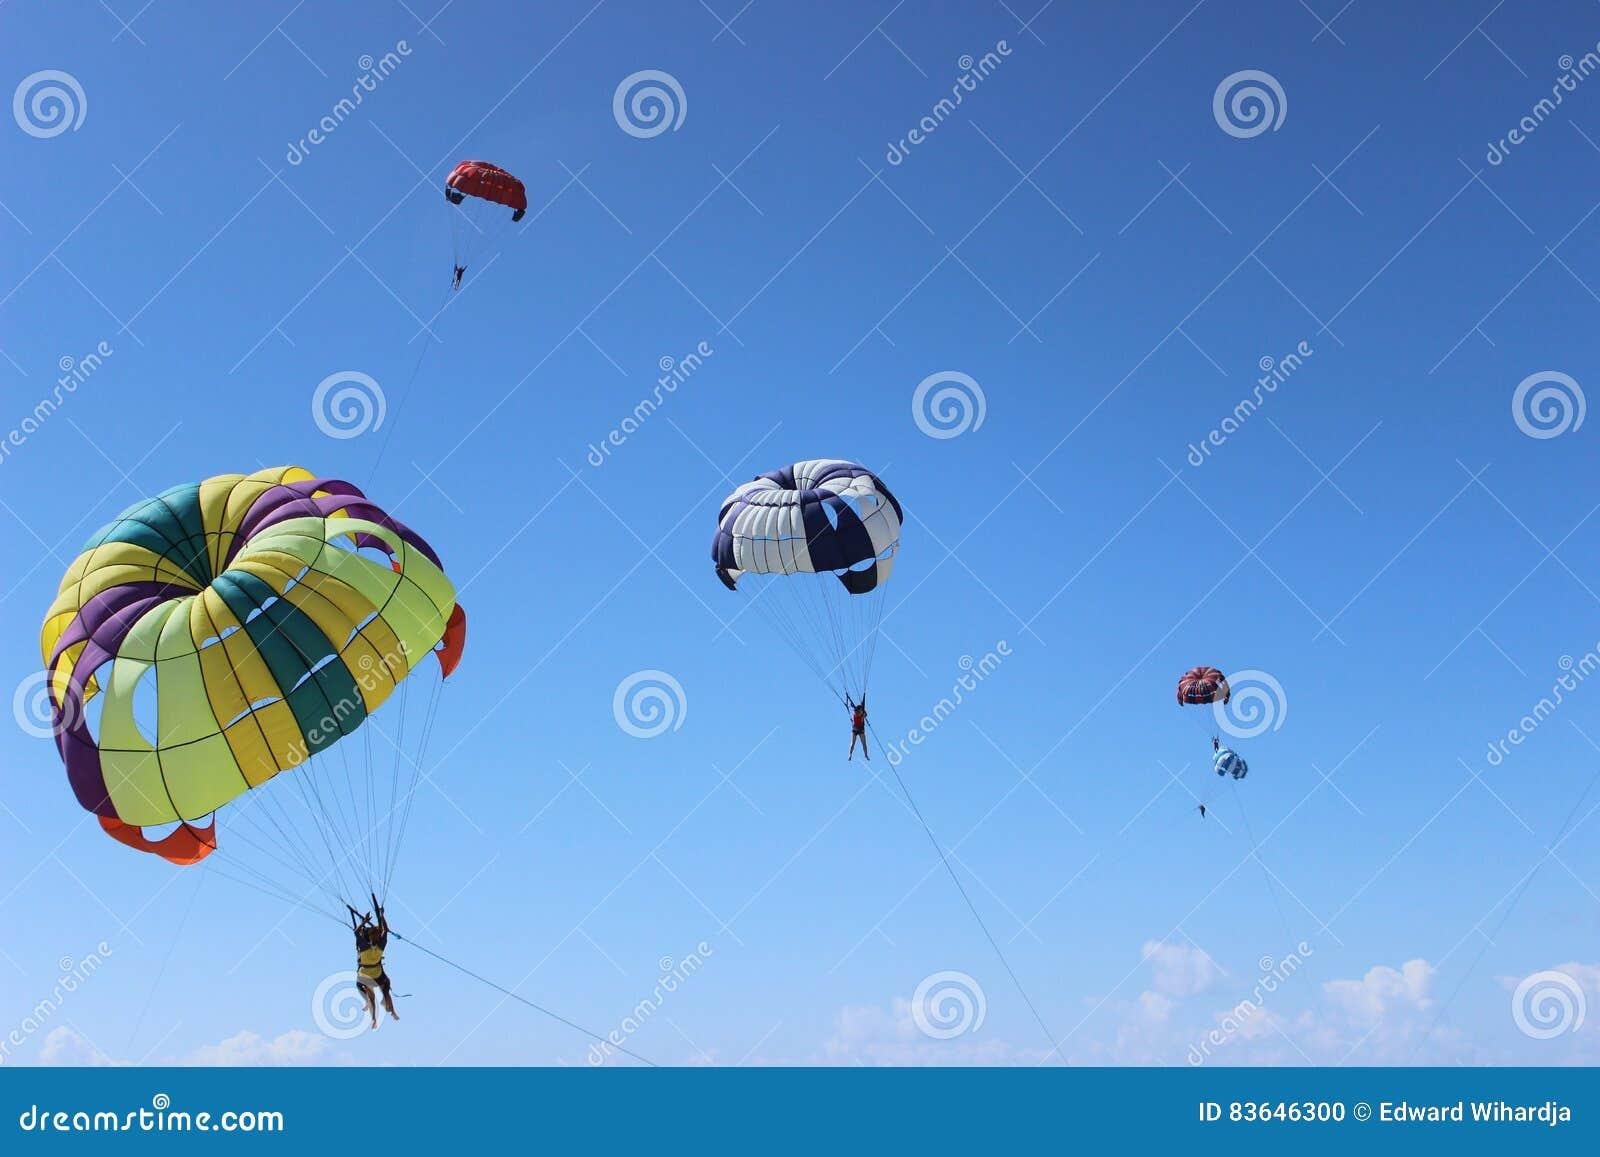 Красочная посадка парашюта на бурном небе